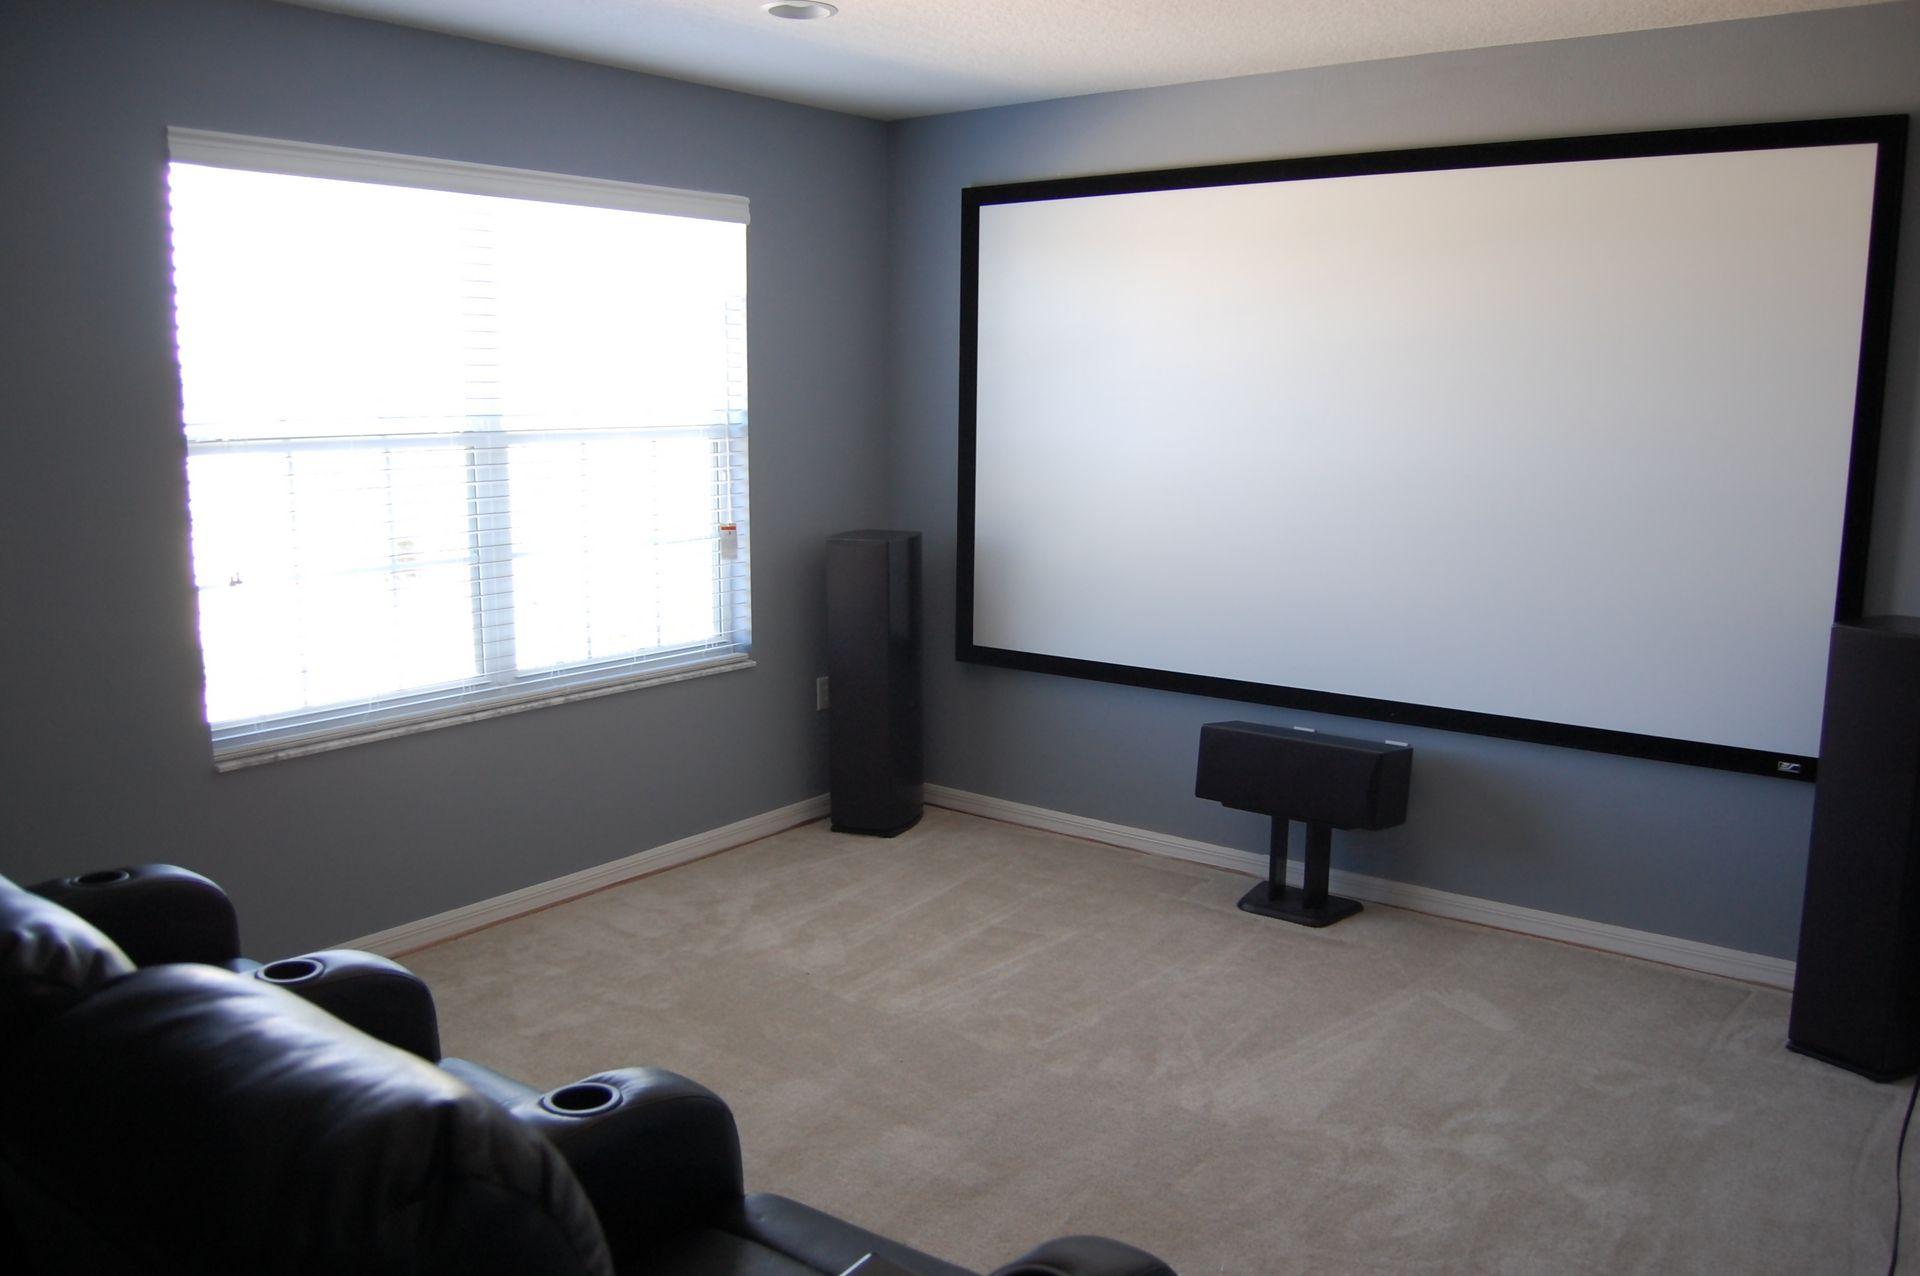 Elite Screen with Elemental Designs